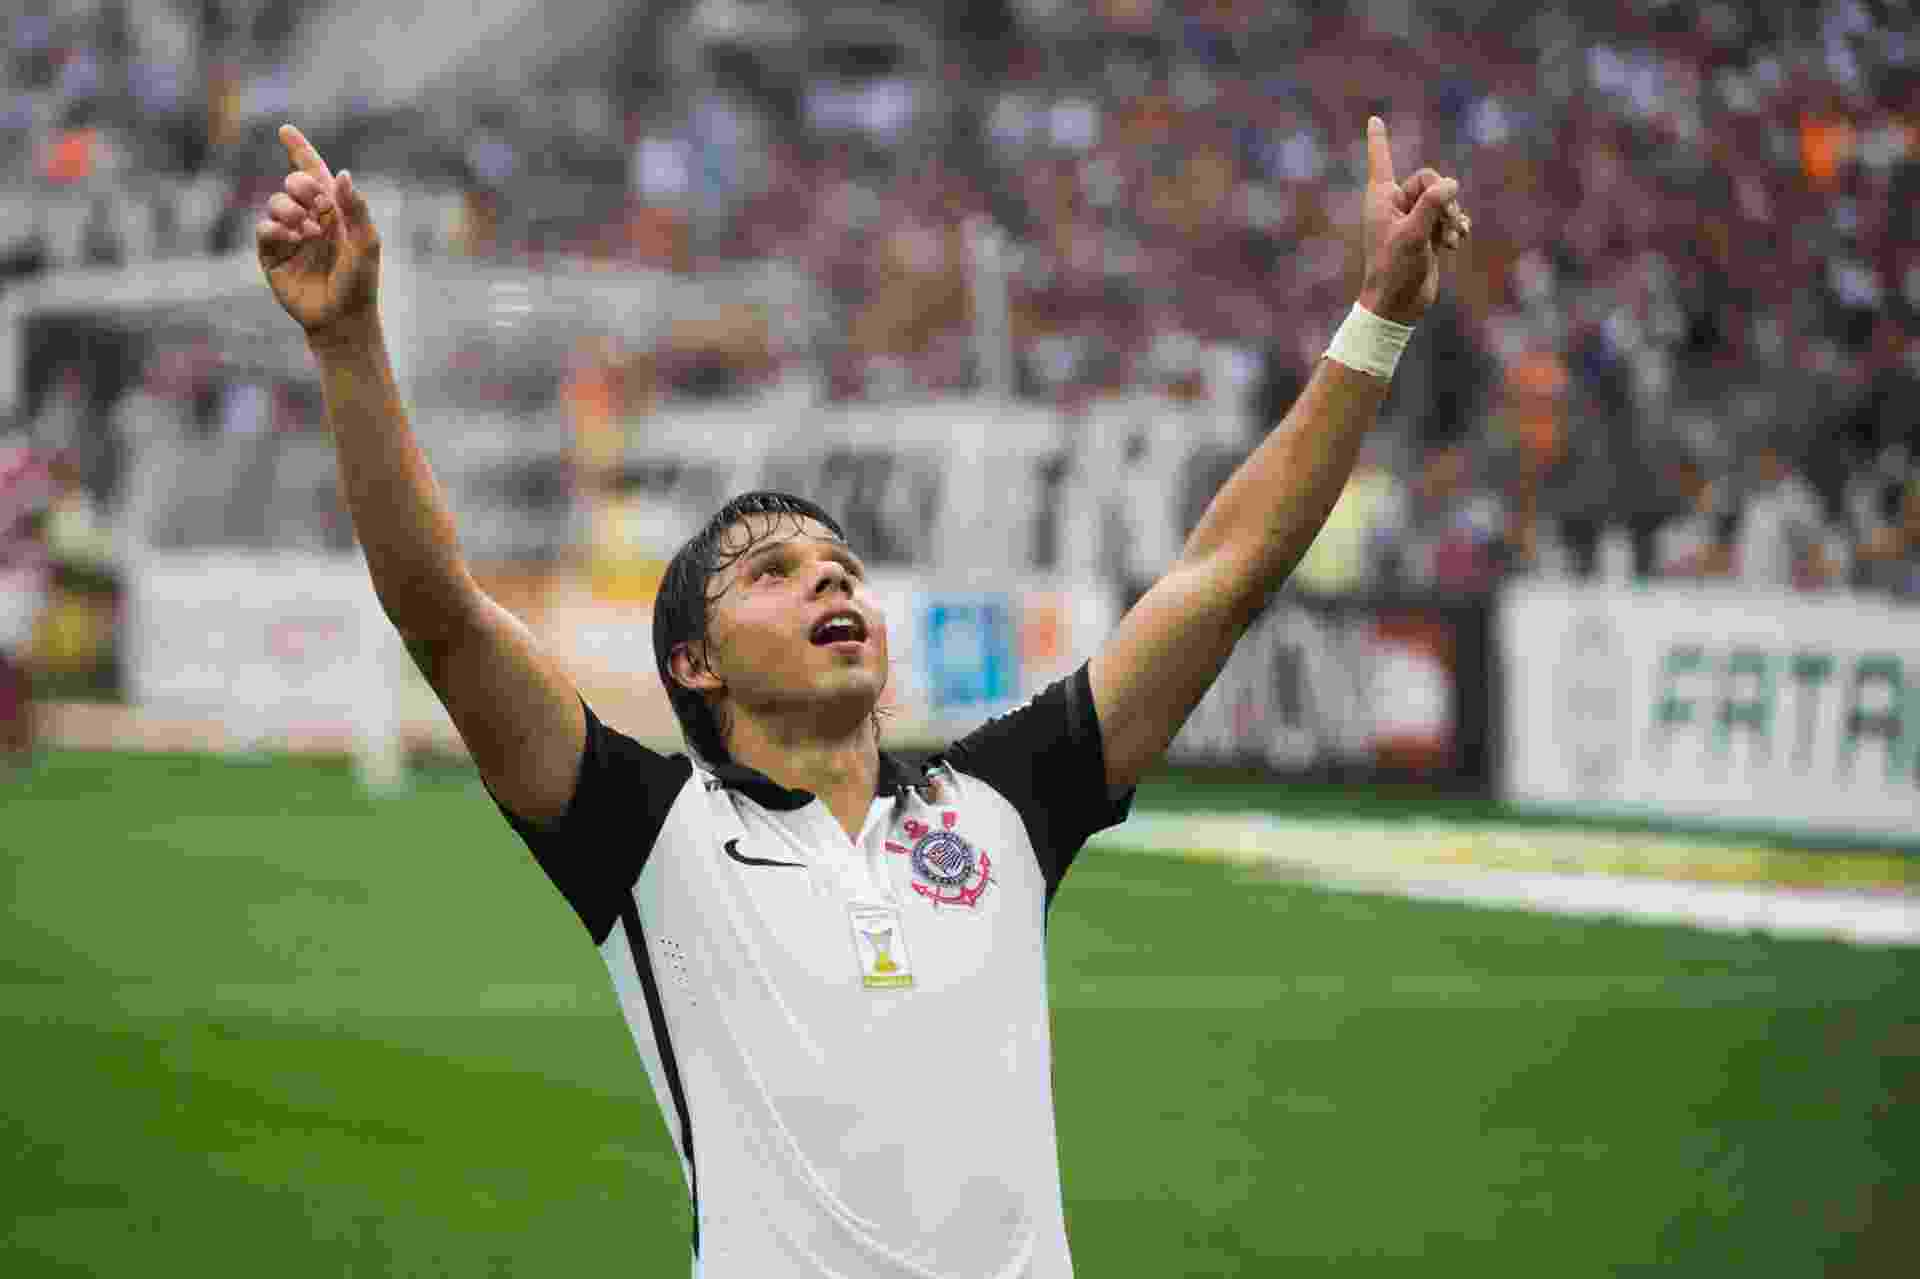 Romero comemora seu segundo gol marcado para o Corinthians sobre o Linense - Danilo Verpa/Folhapress